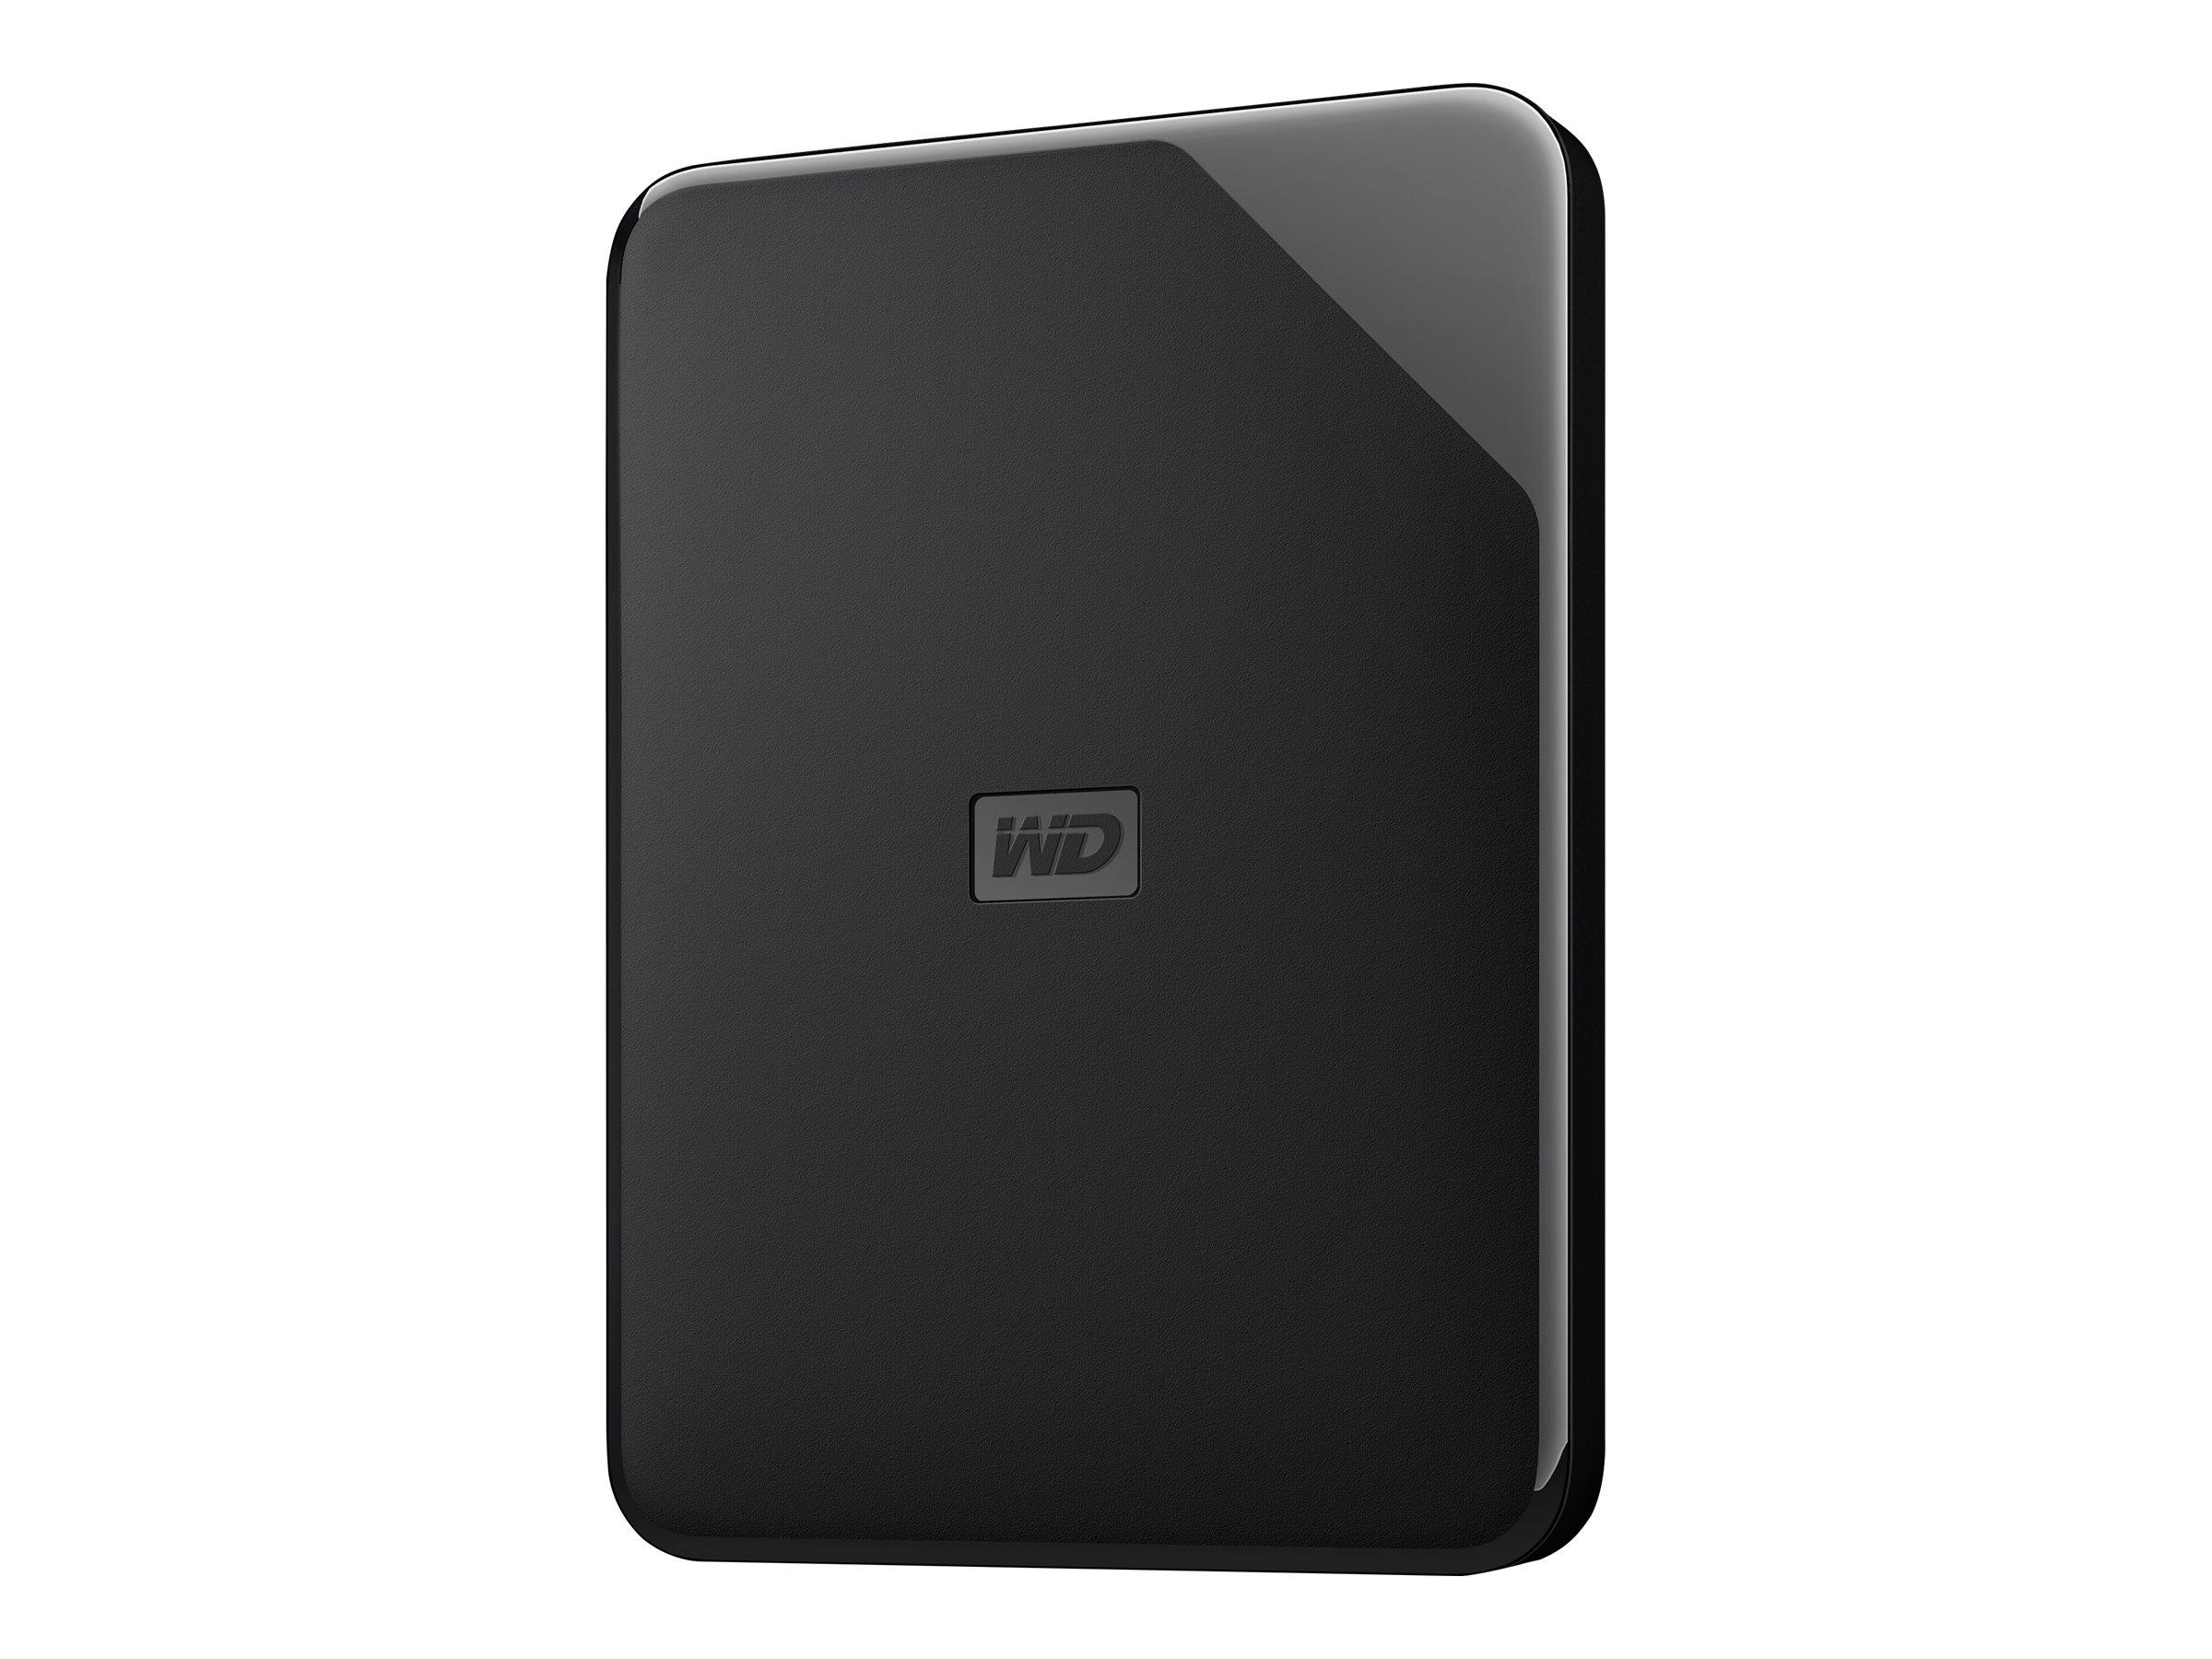 WD Elements SE WDBEPK5000ABK - Festplatte - 500 GB - extern (tragbar)